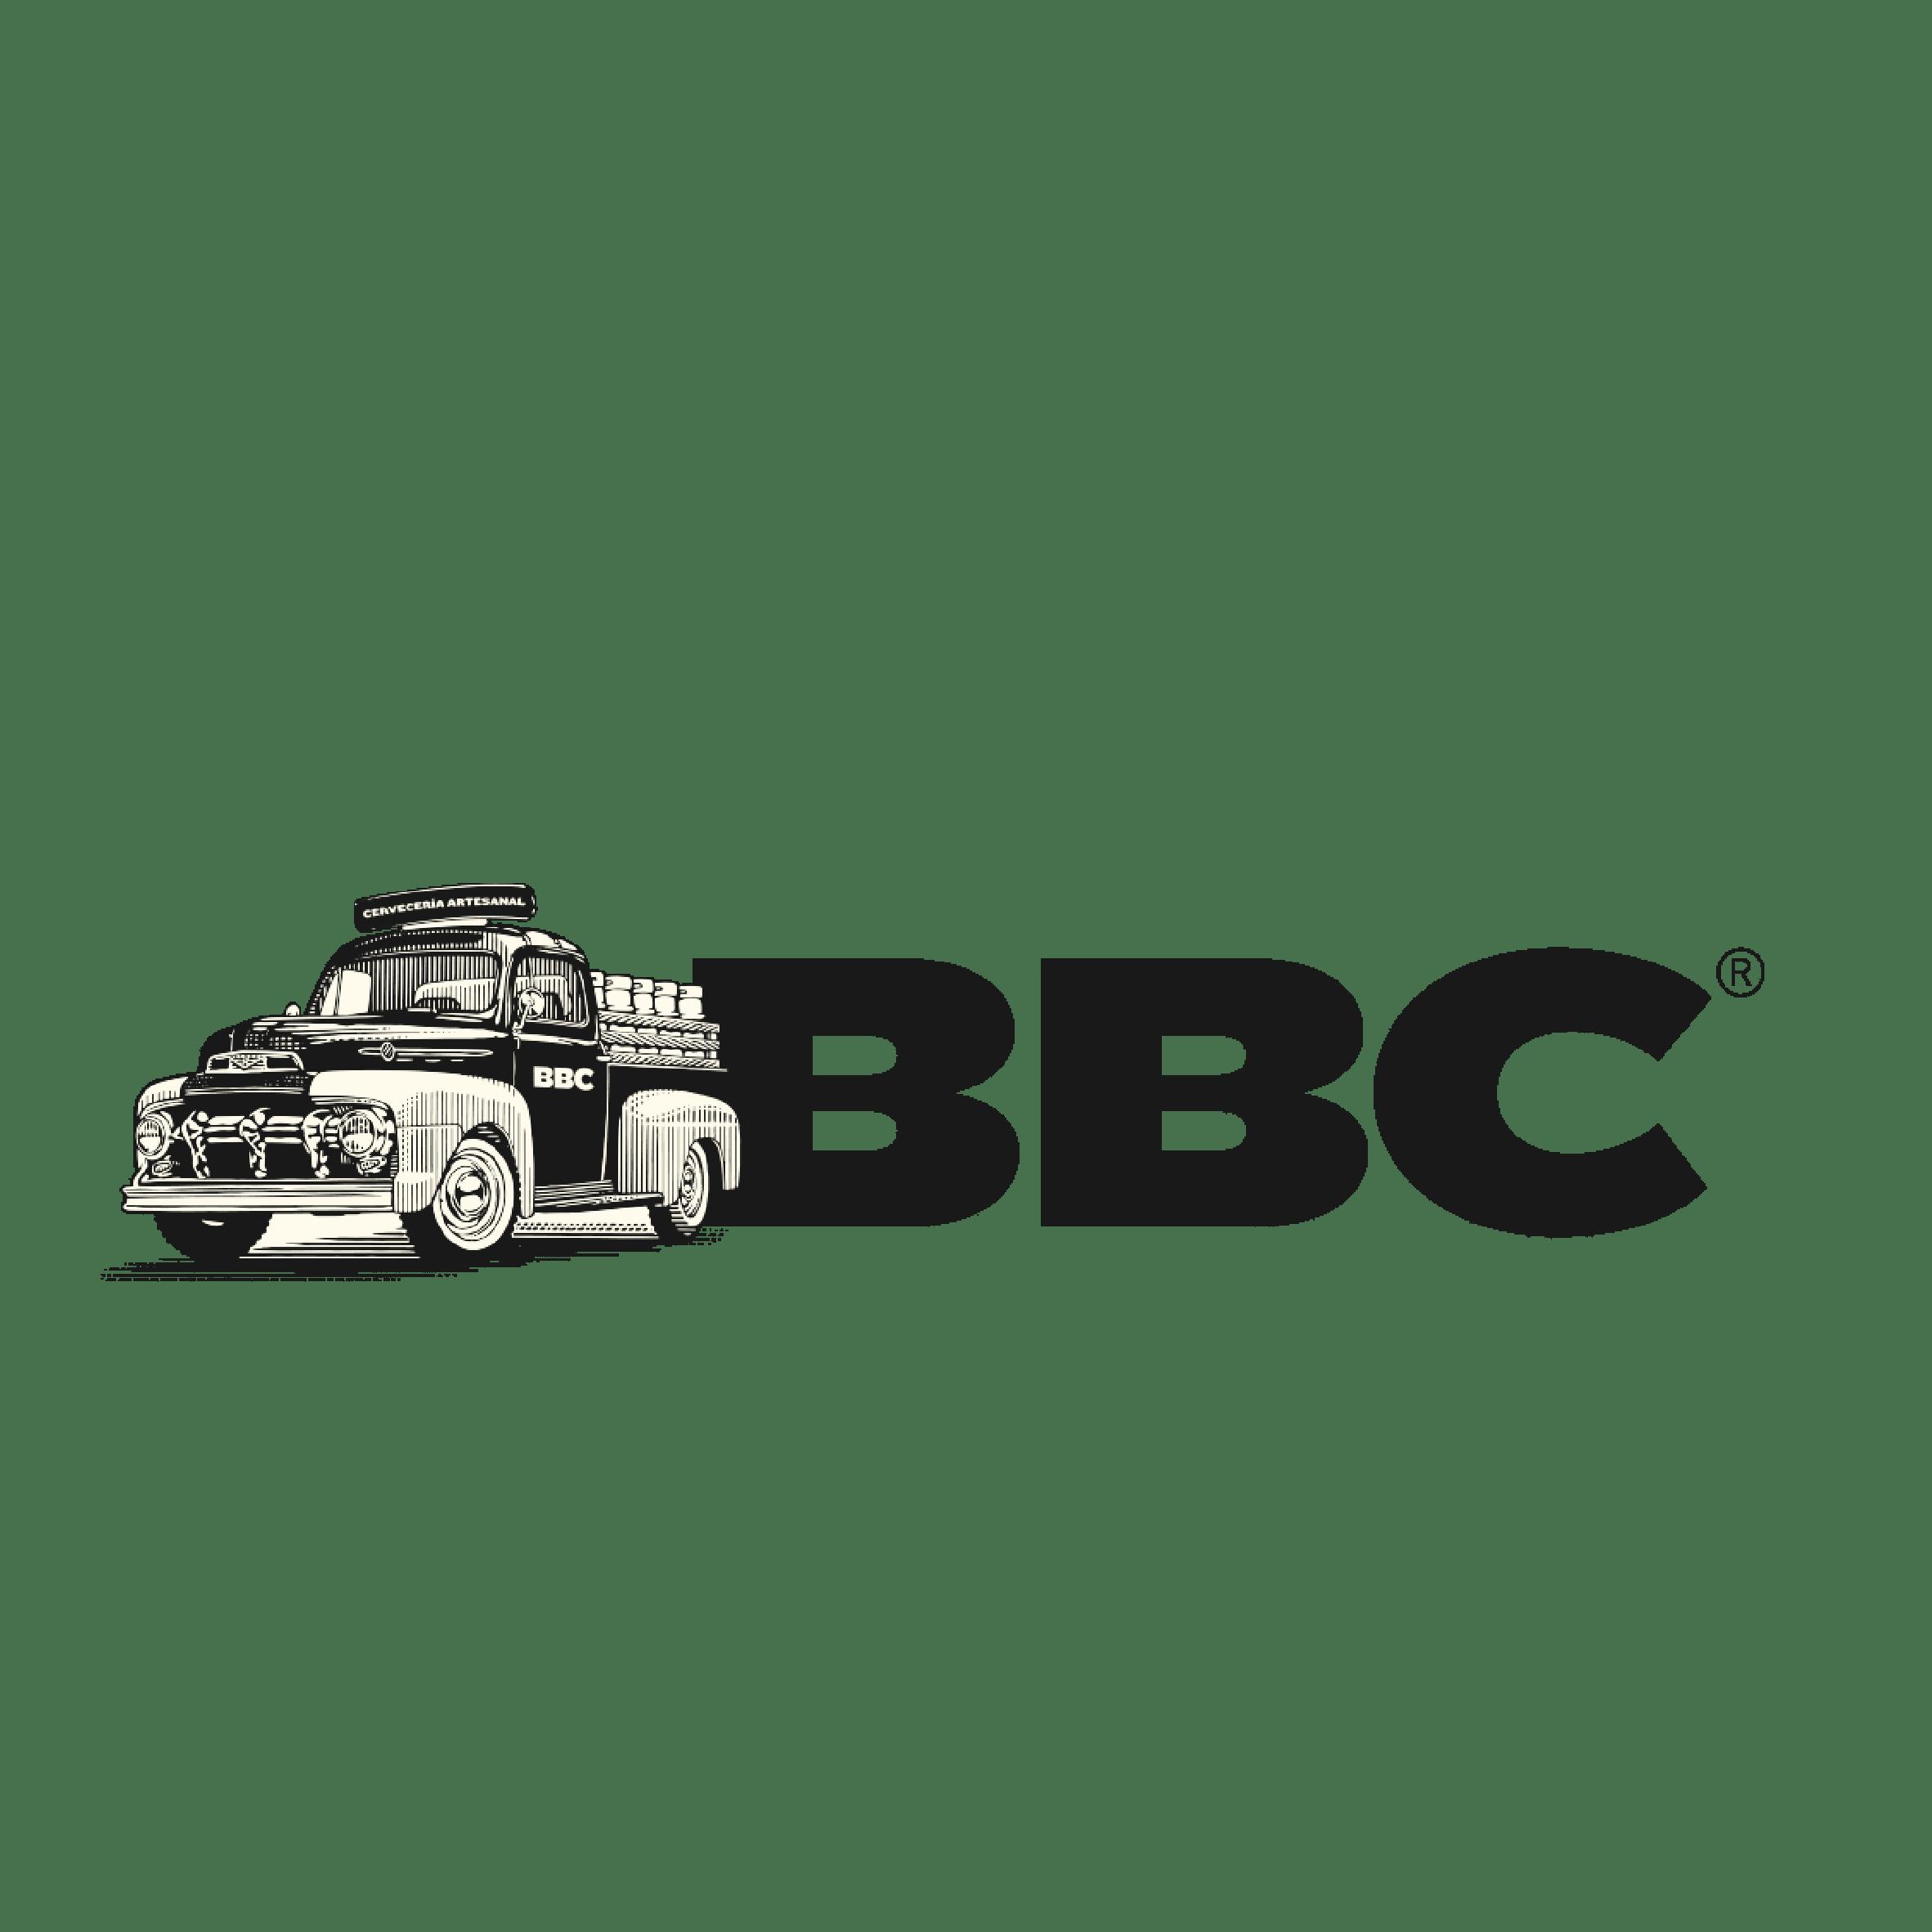 Responsabilidad Ambiental- BBC